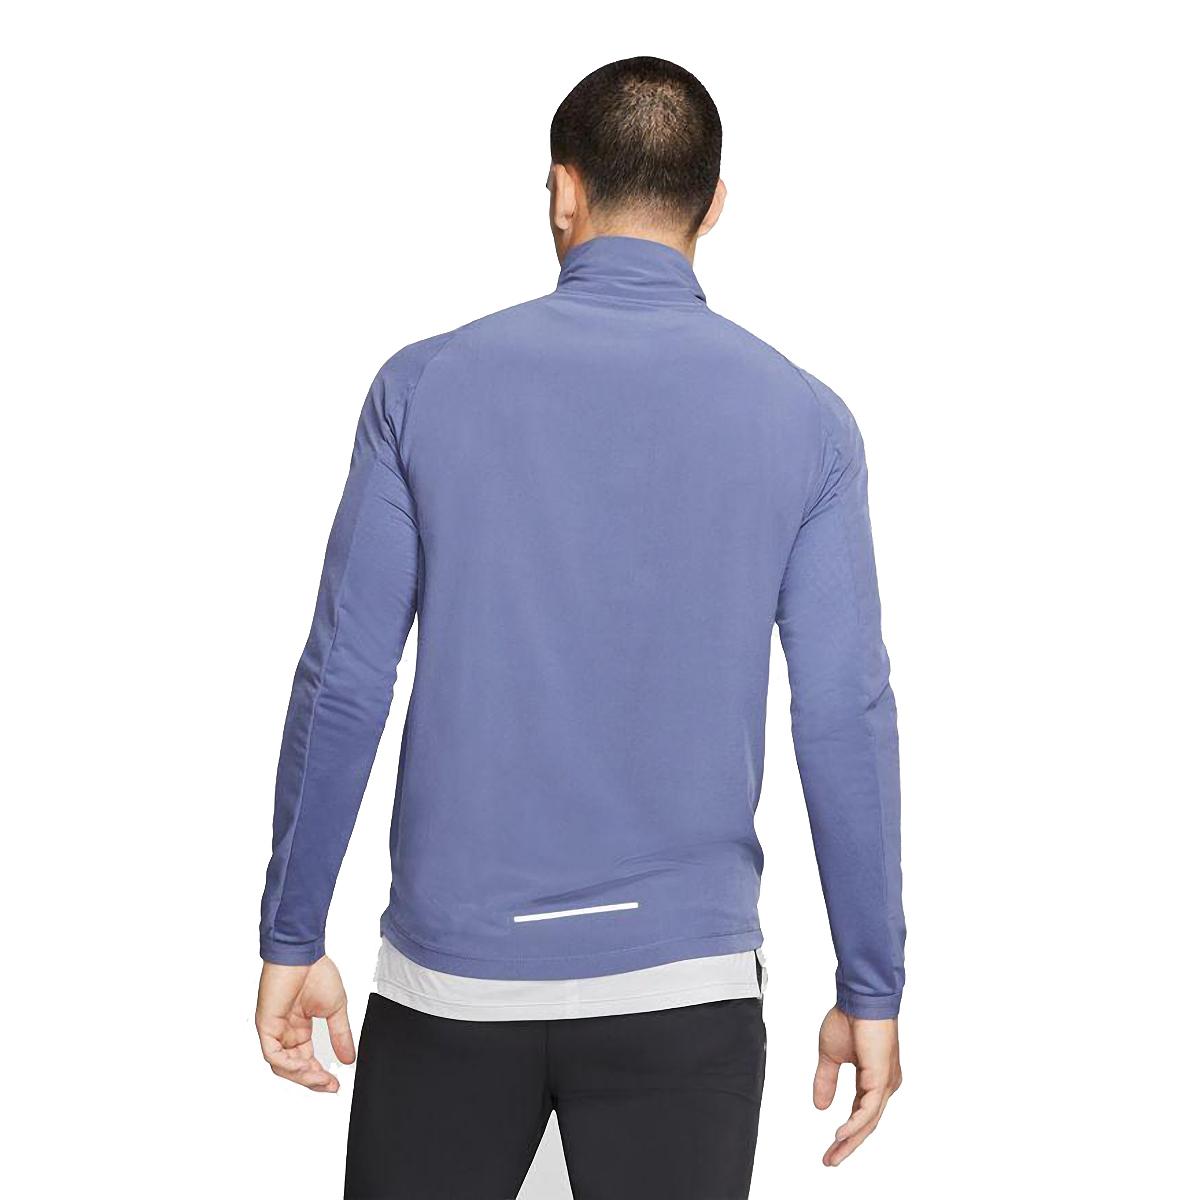 Men's Nike Element Full Zip, , large, image 2